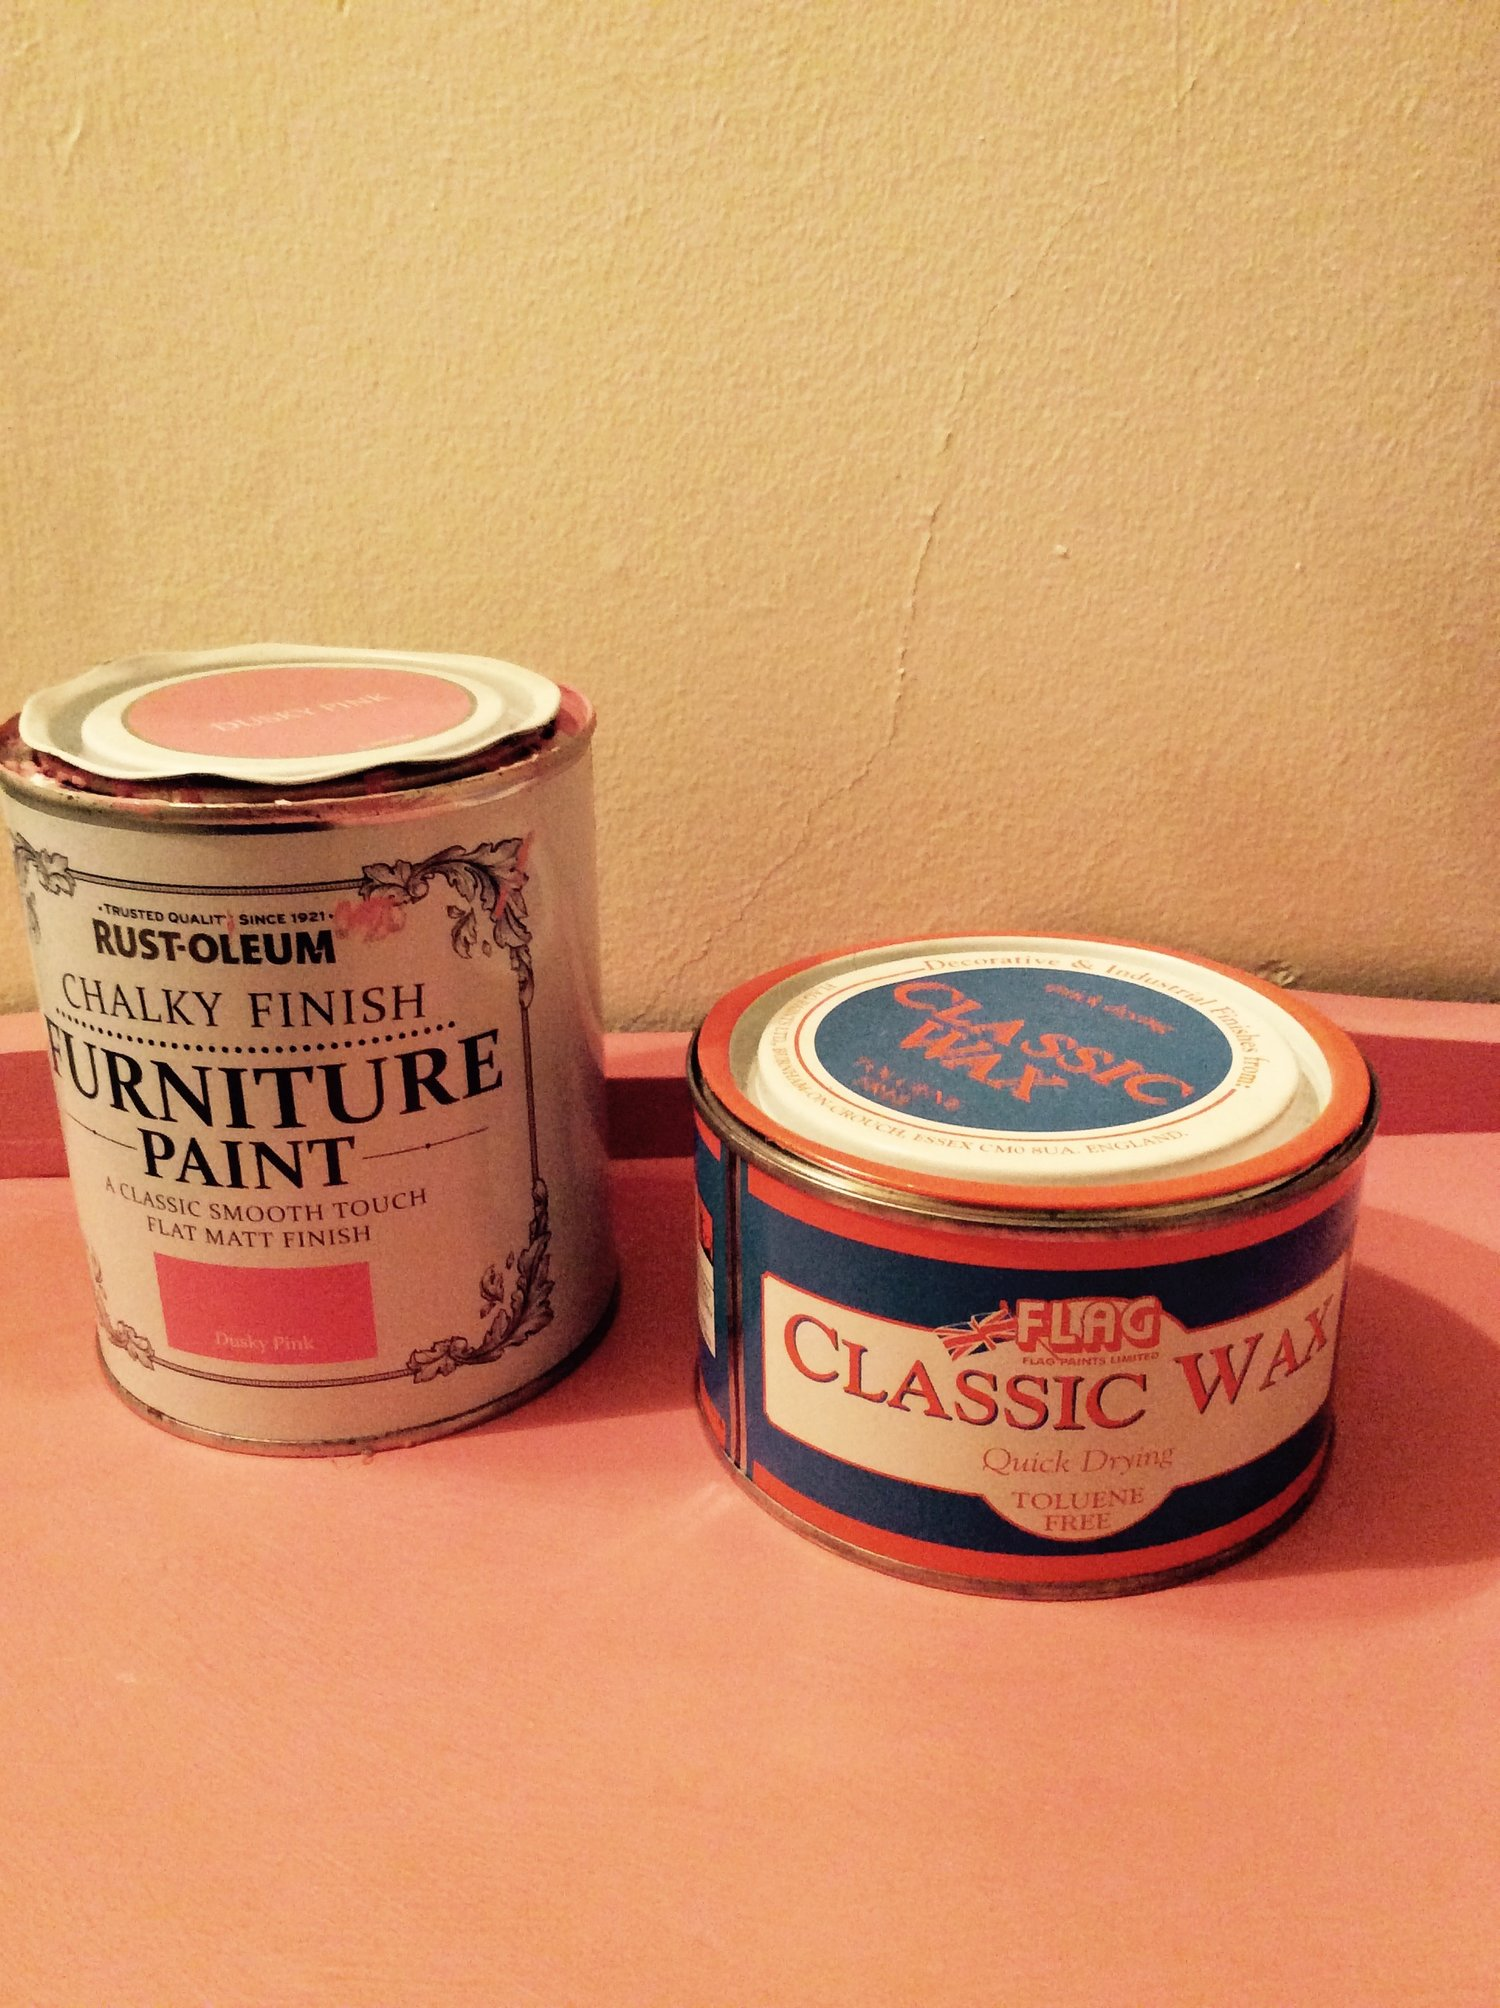 Dusky Pink Rustleum Chalk Paint and Flag Classic Wax.